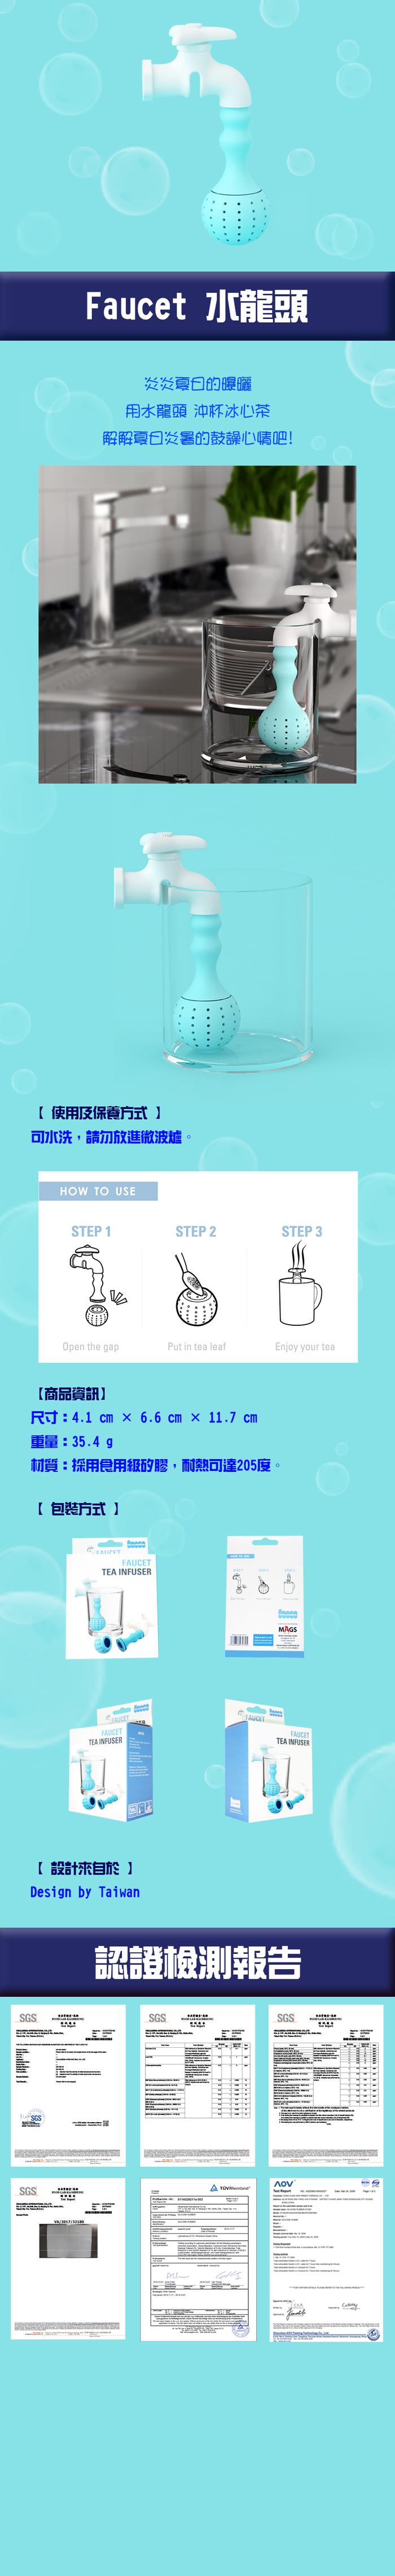 (複製)Hikalimedia Melting ice & bears 北極熊泡茶器